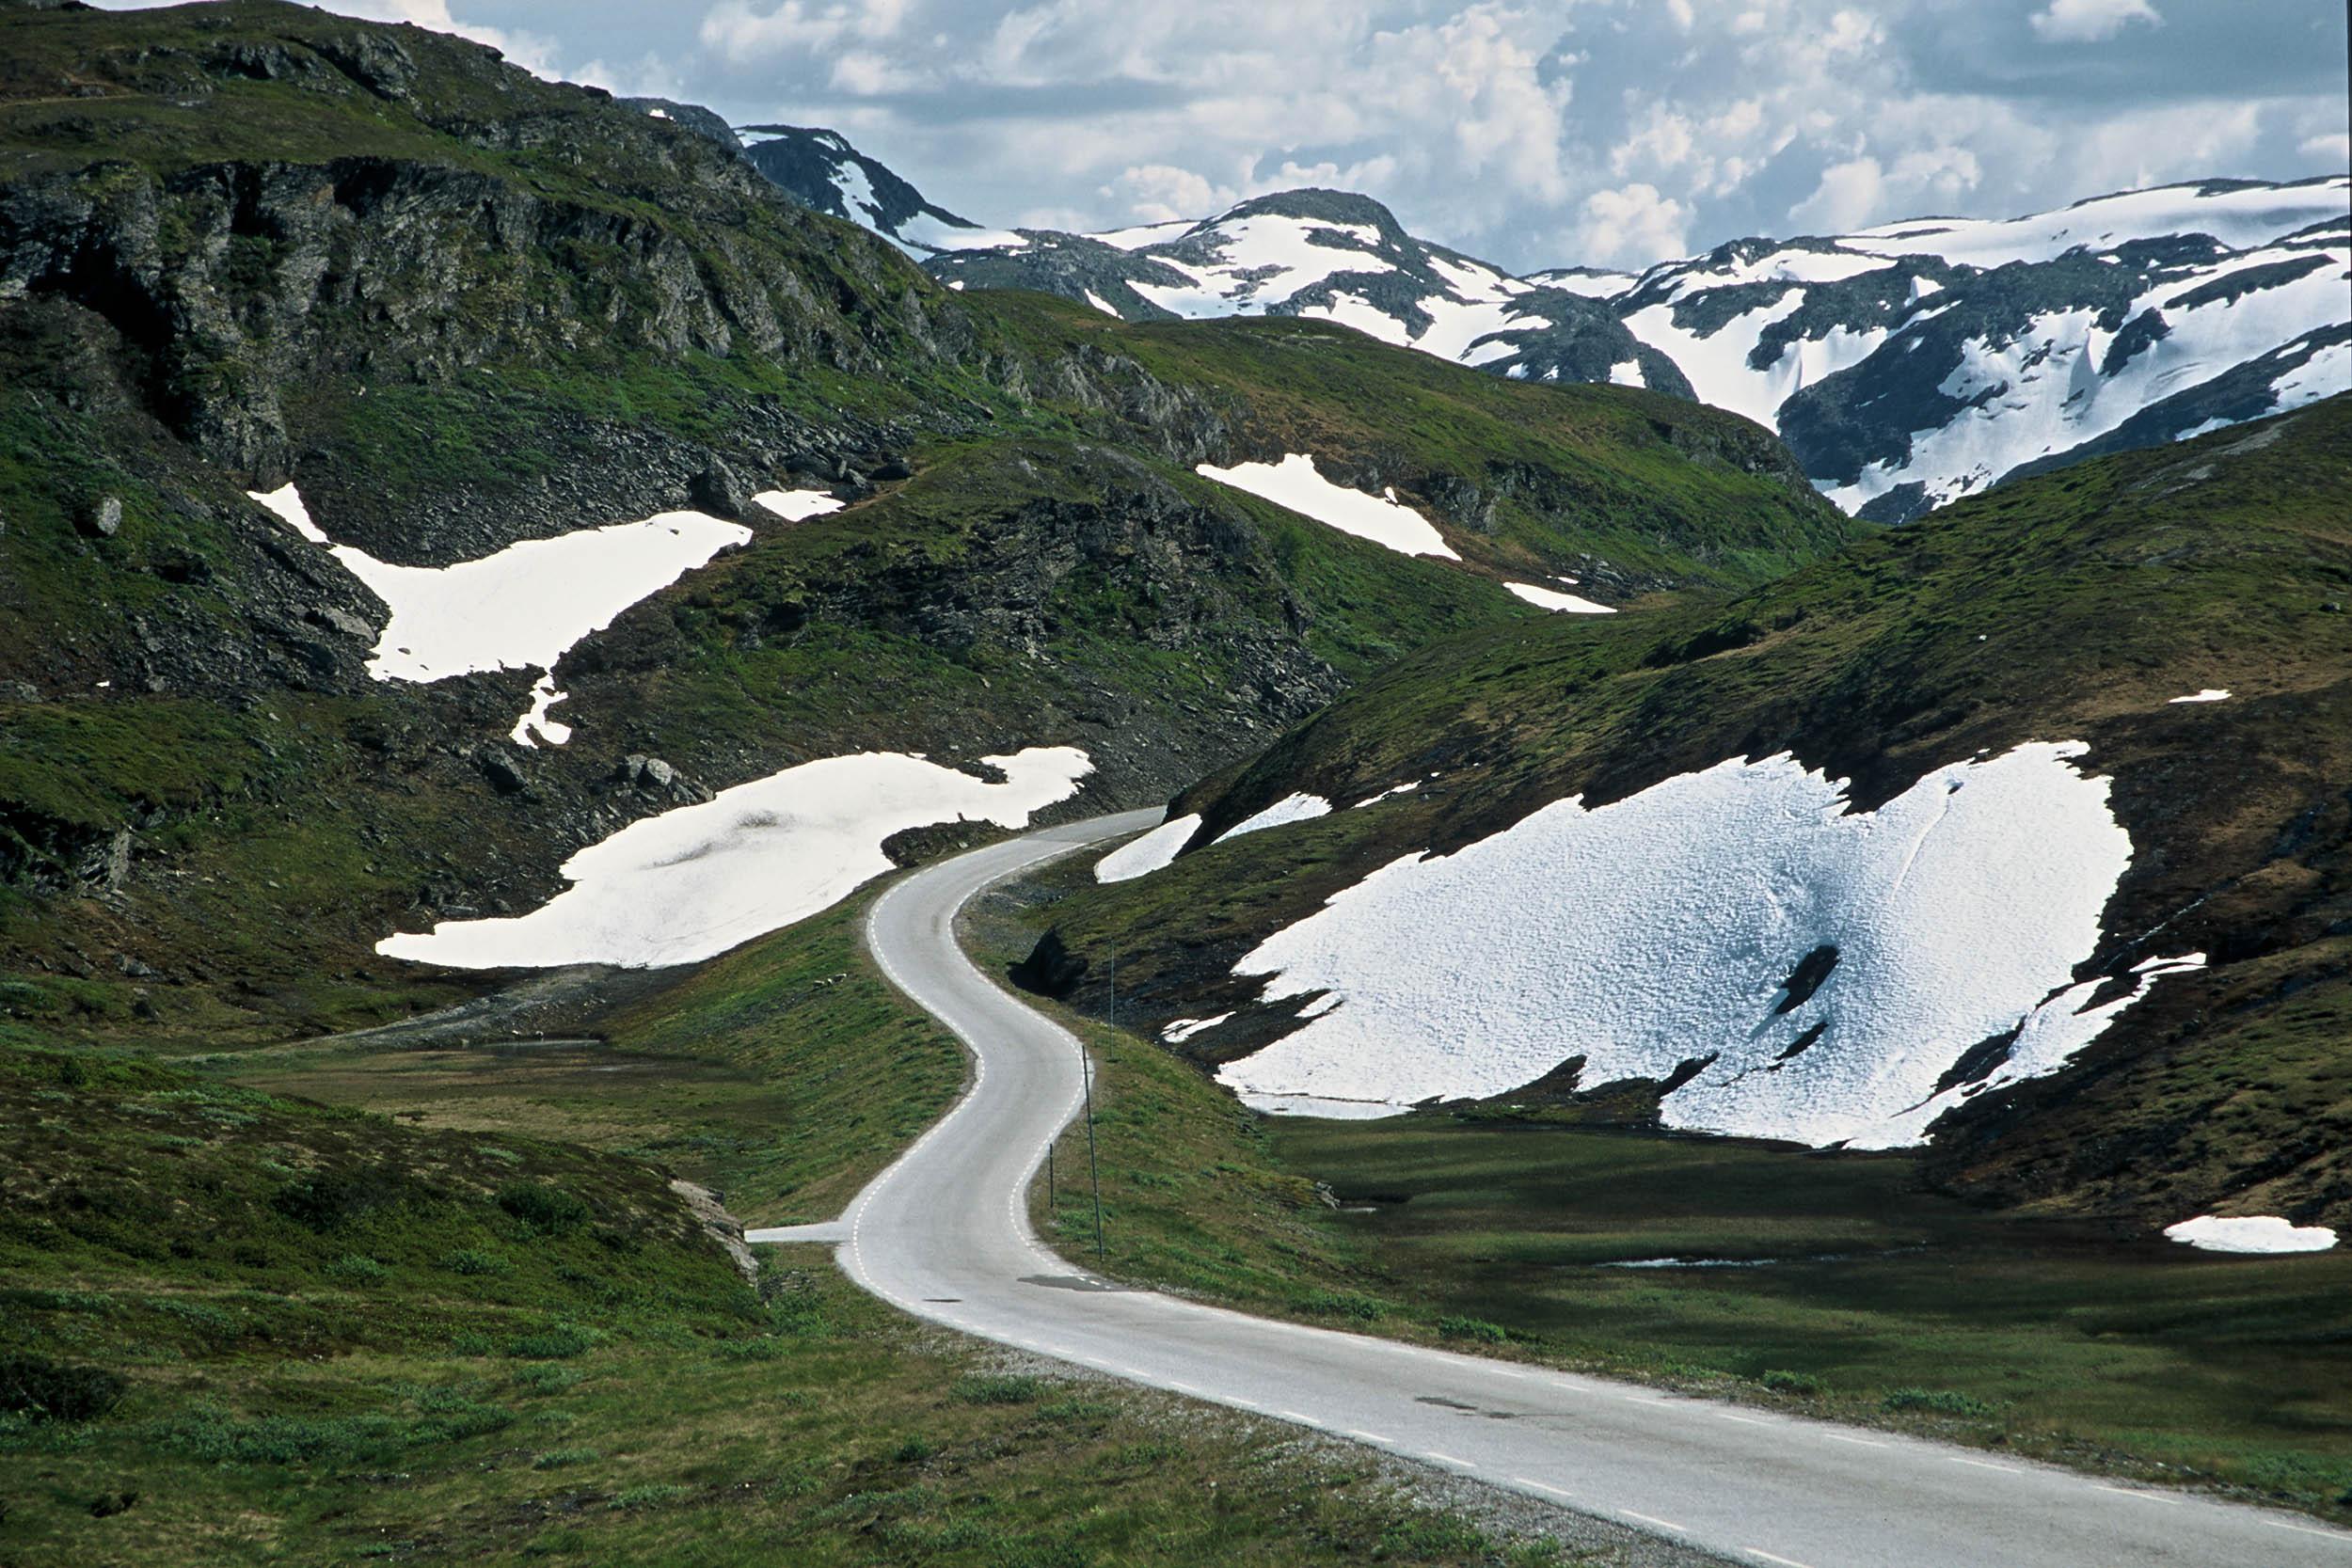 norwegen-strasse-fjell-schnee